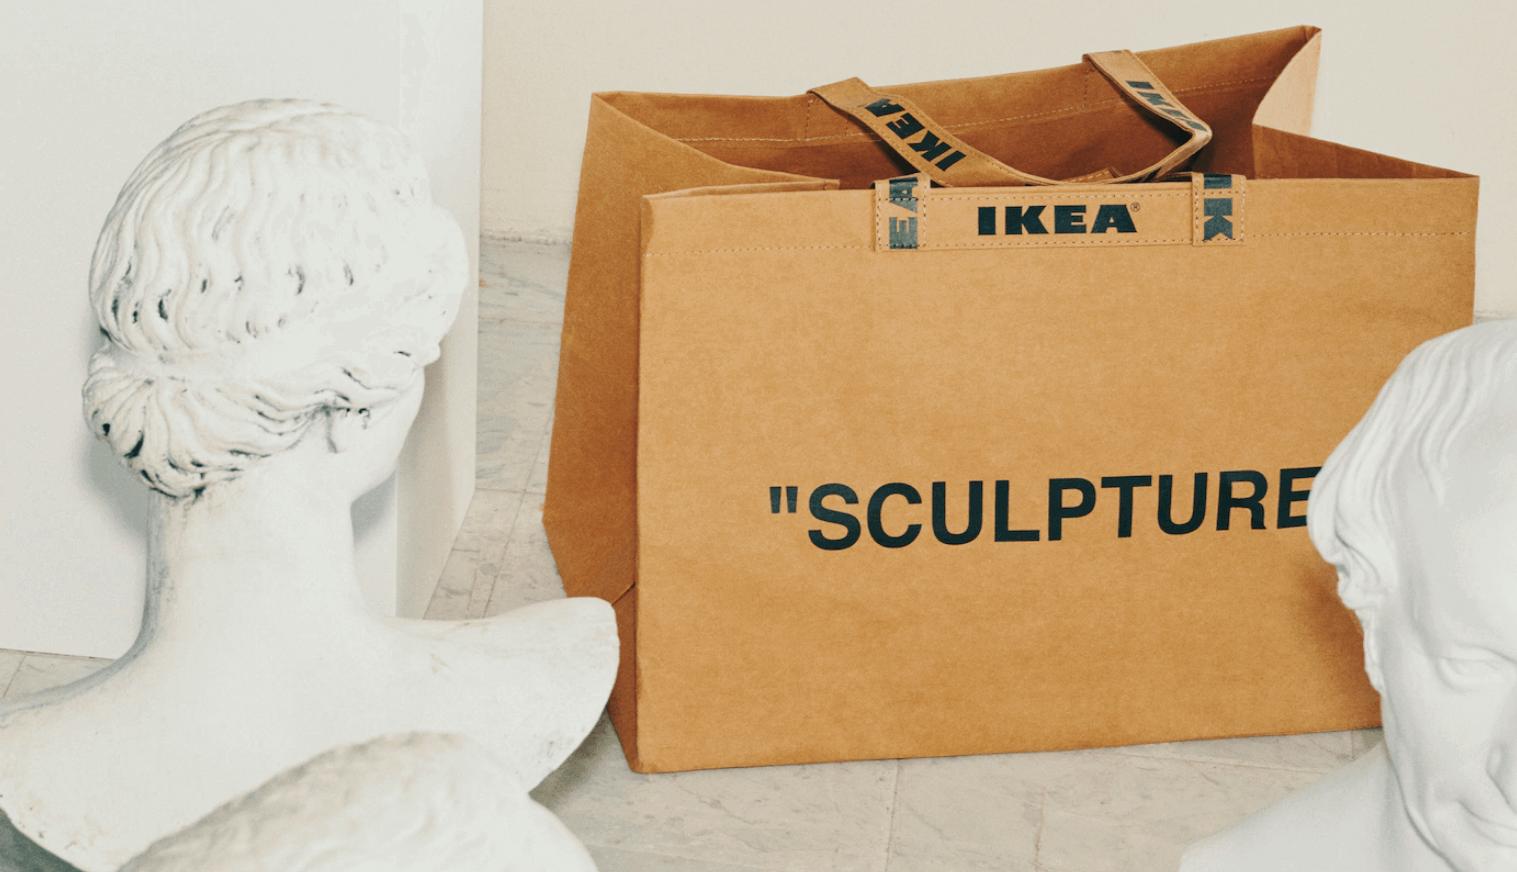 skulptur fra IKEA